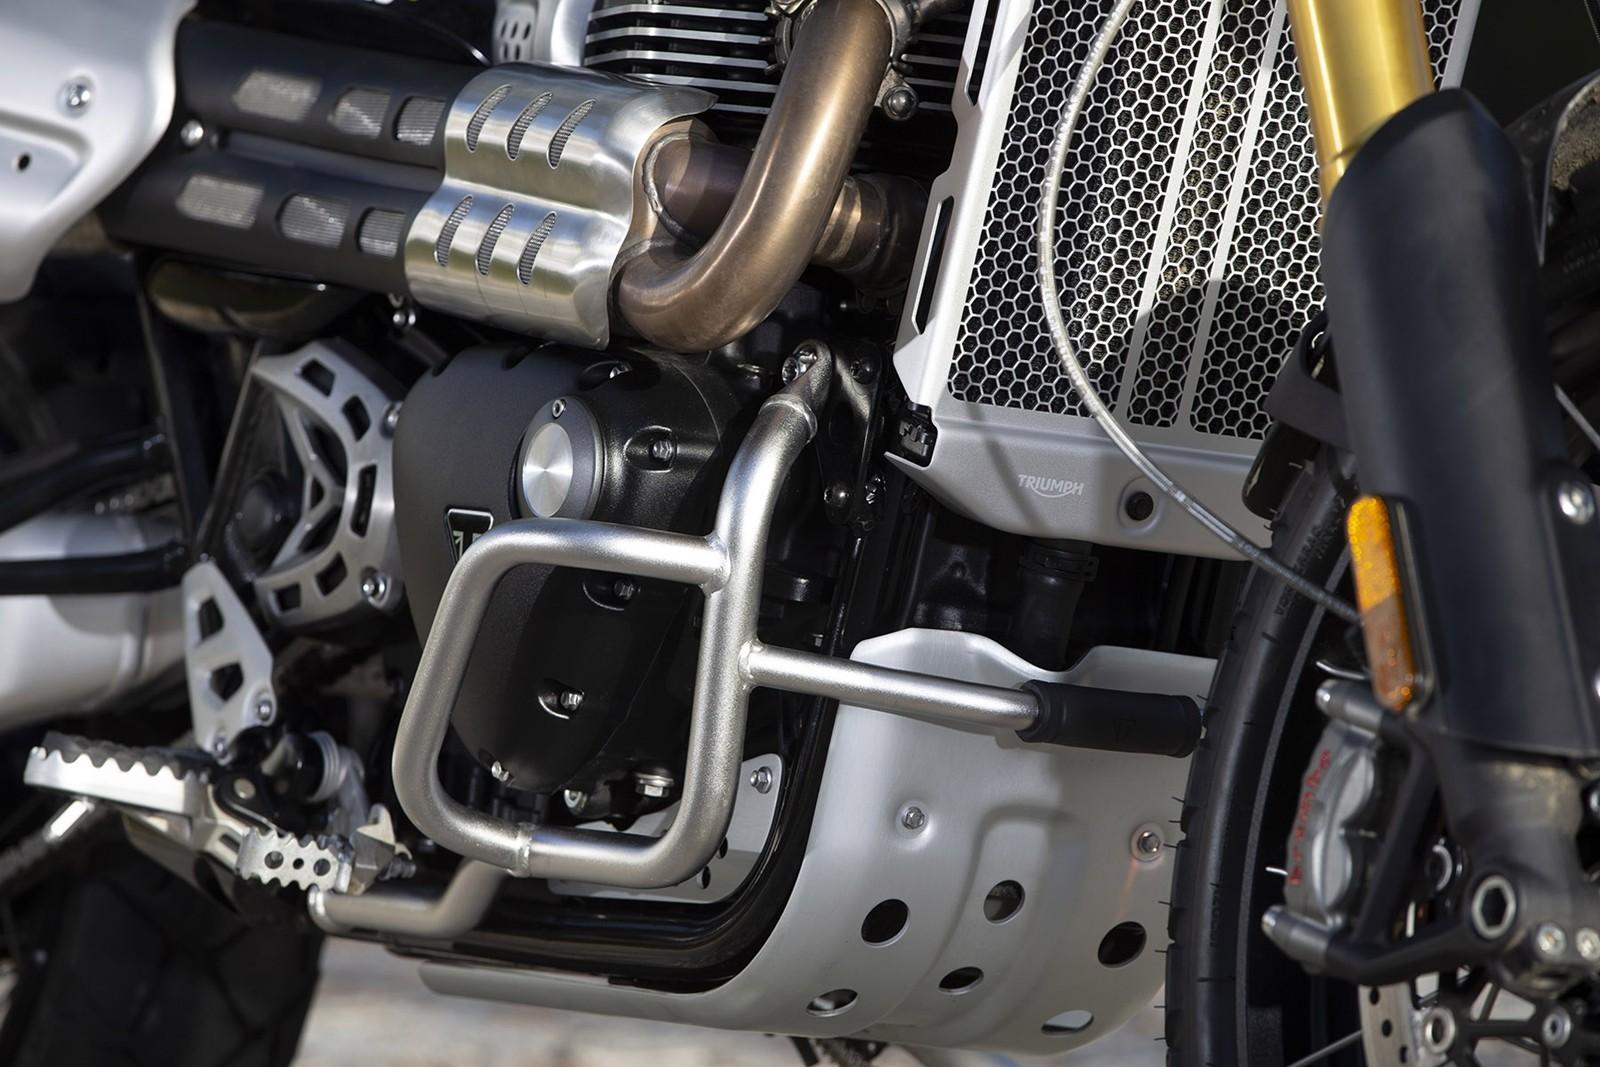 Foto de Triumph Scrambler 1200 XC y XE 2019 (84/91)